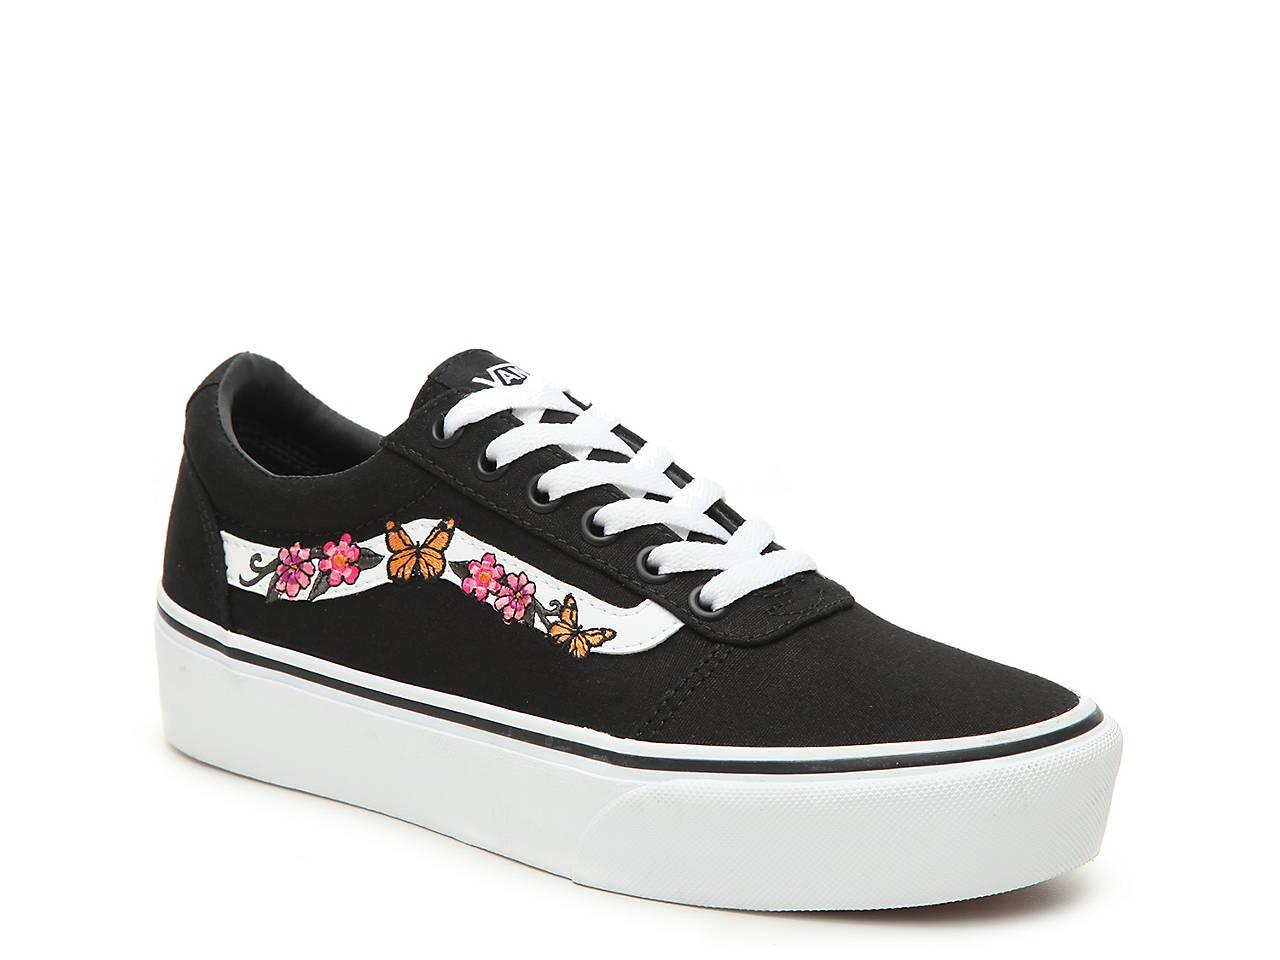 0b38153d5d Vans Ward Platform Sneaker - Women s Women s Shoes